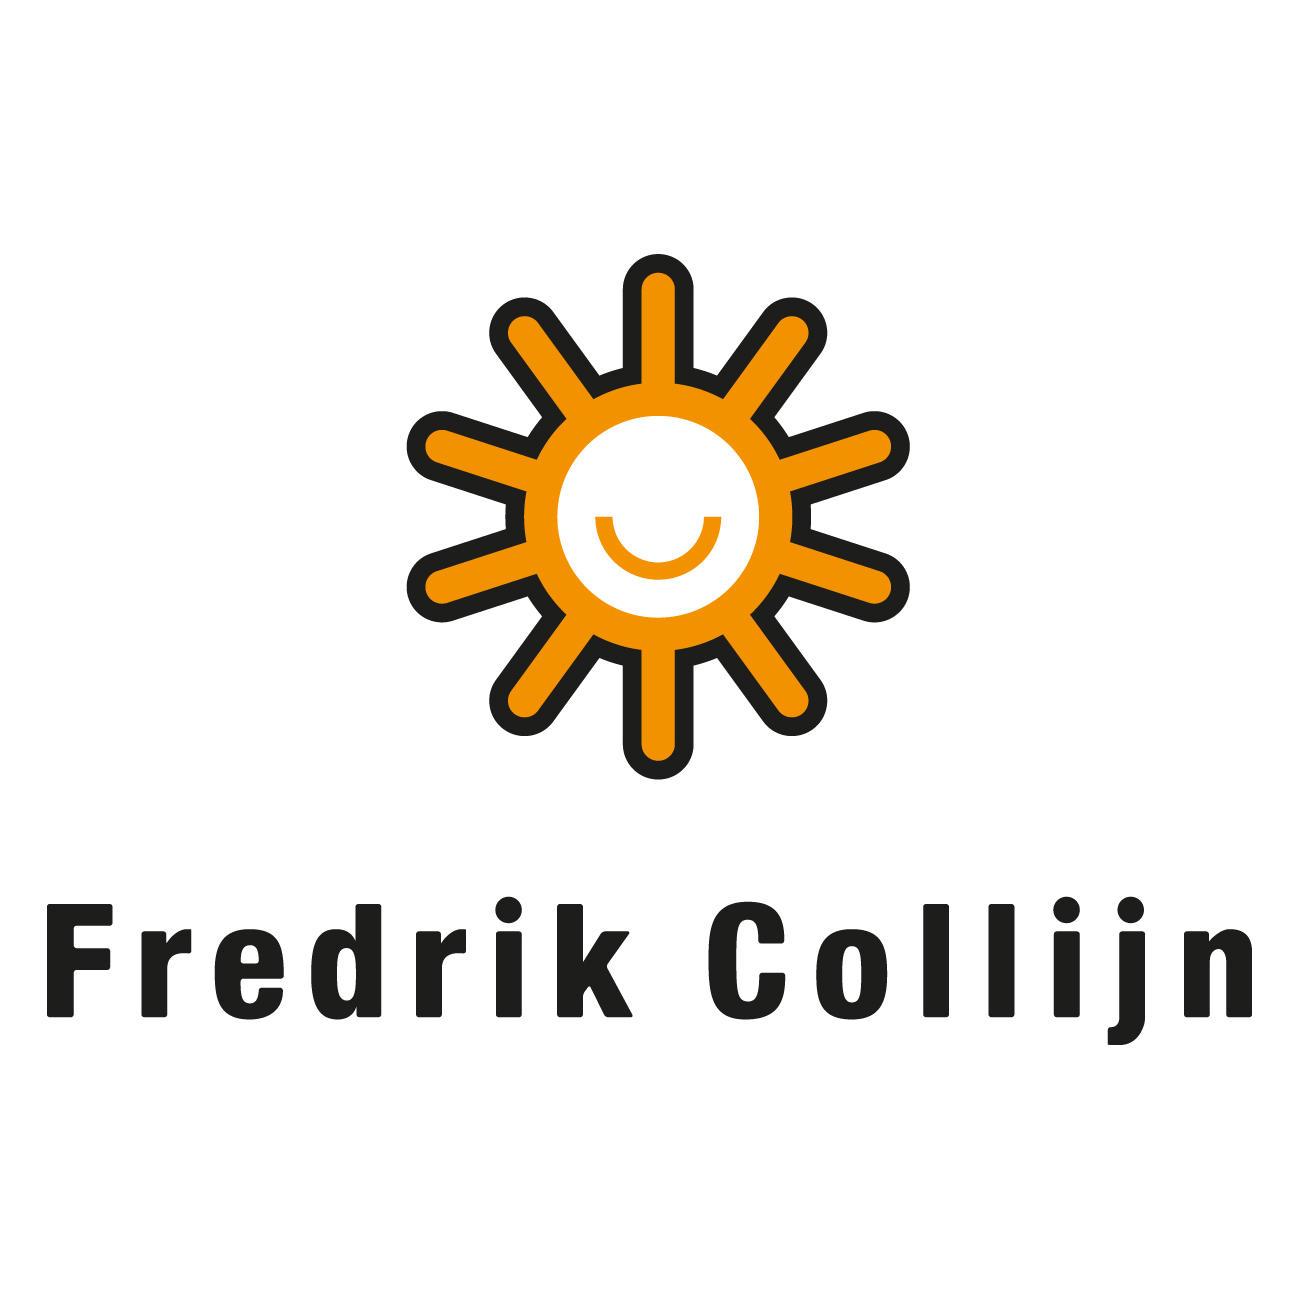 Fredrik Collijn AB